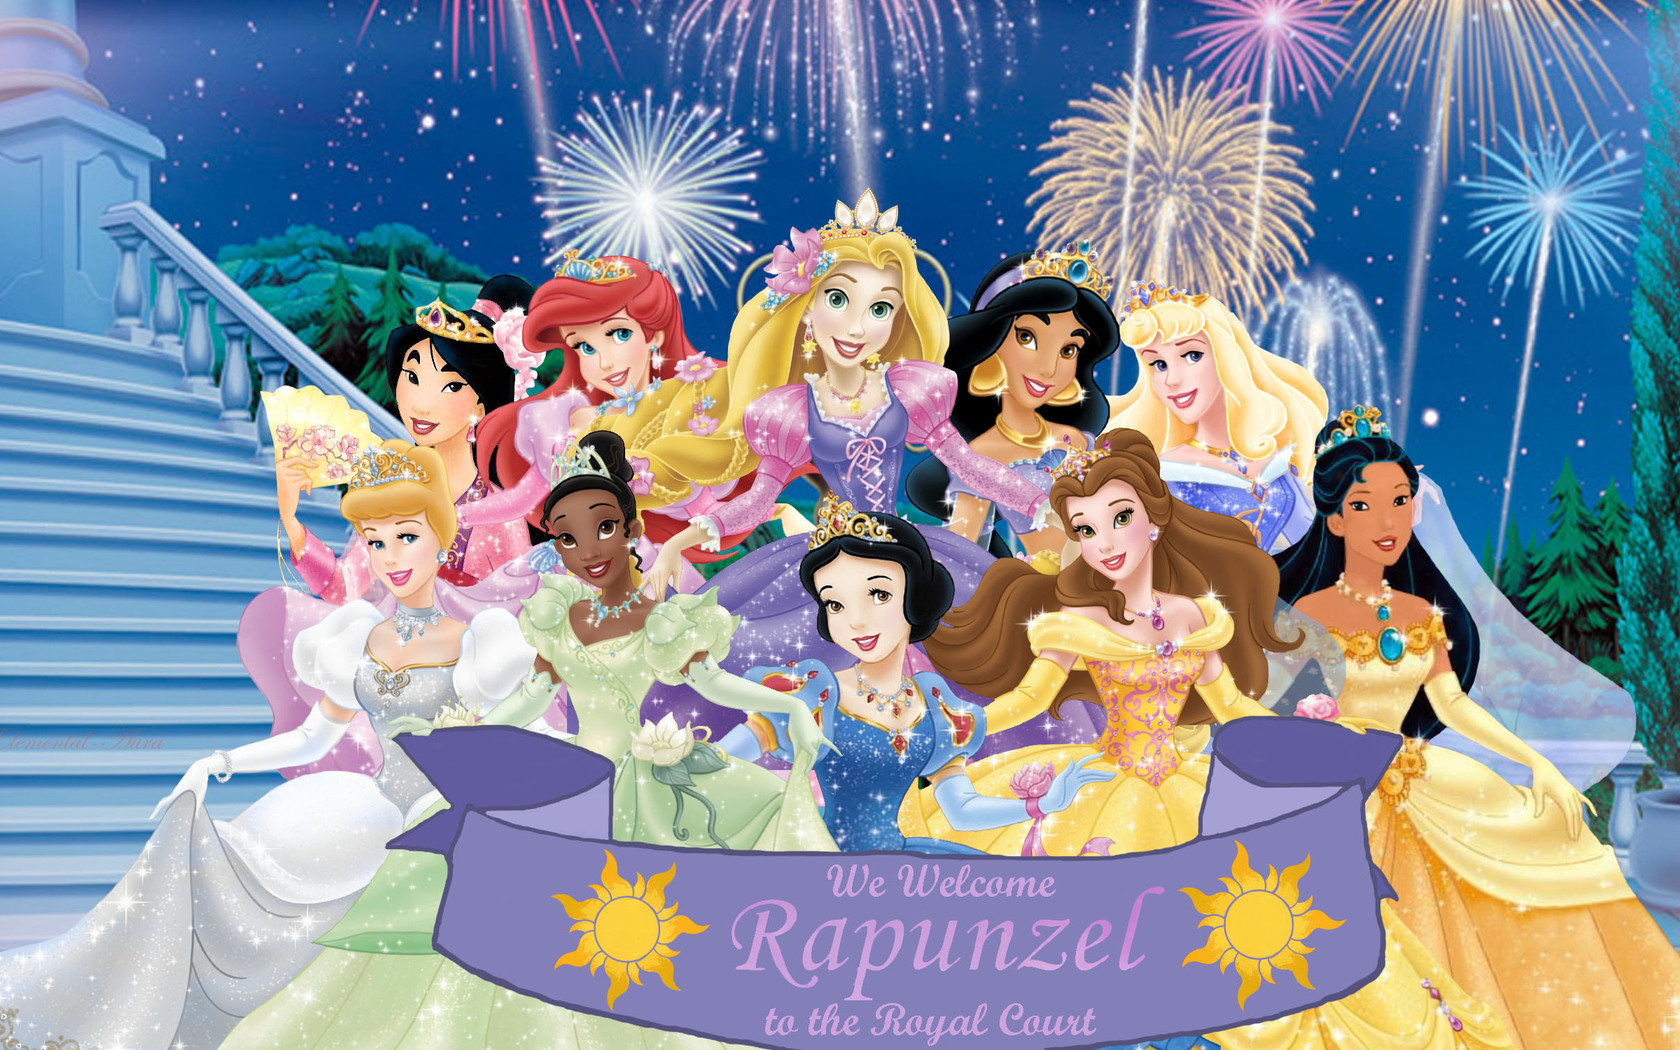 Disney Princess Wallpaper 19, Pictures, Desktop Wallpapers